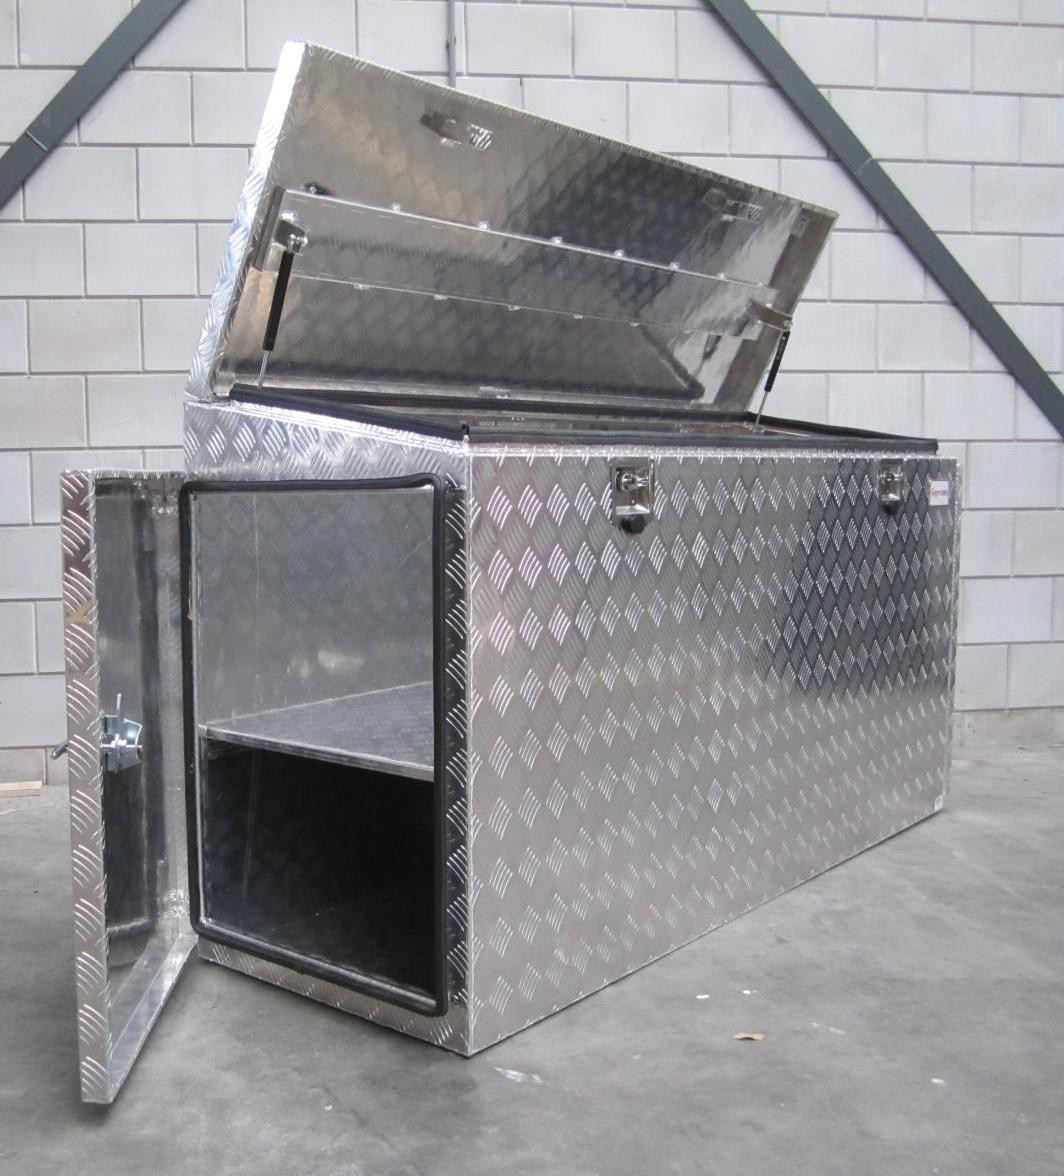 Aluminium Opberg Kist.Gepro Gepro Box Zijdeuren Kisten Viborg 1900 Aluminium